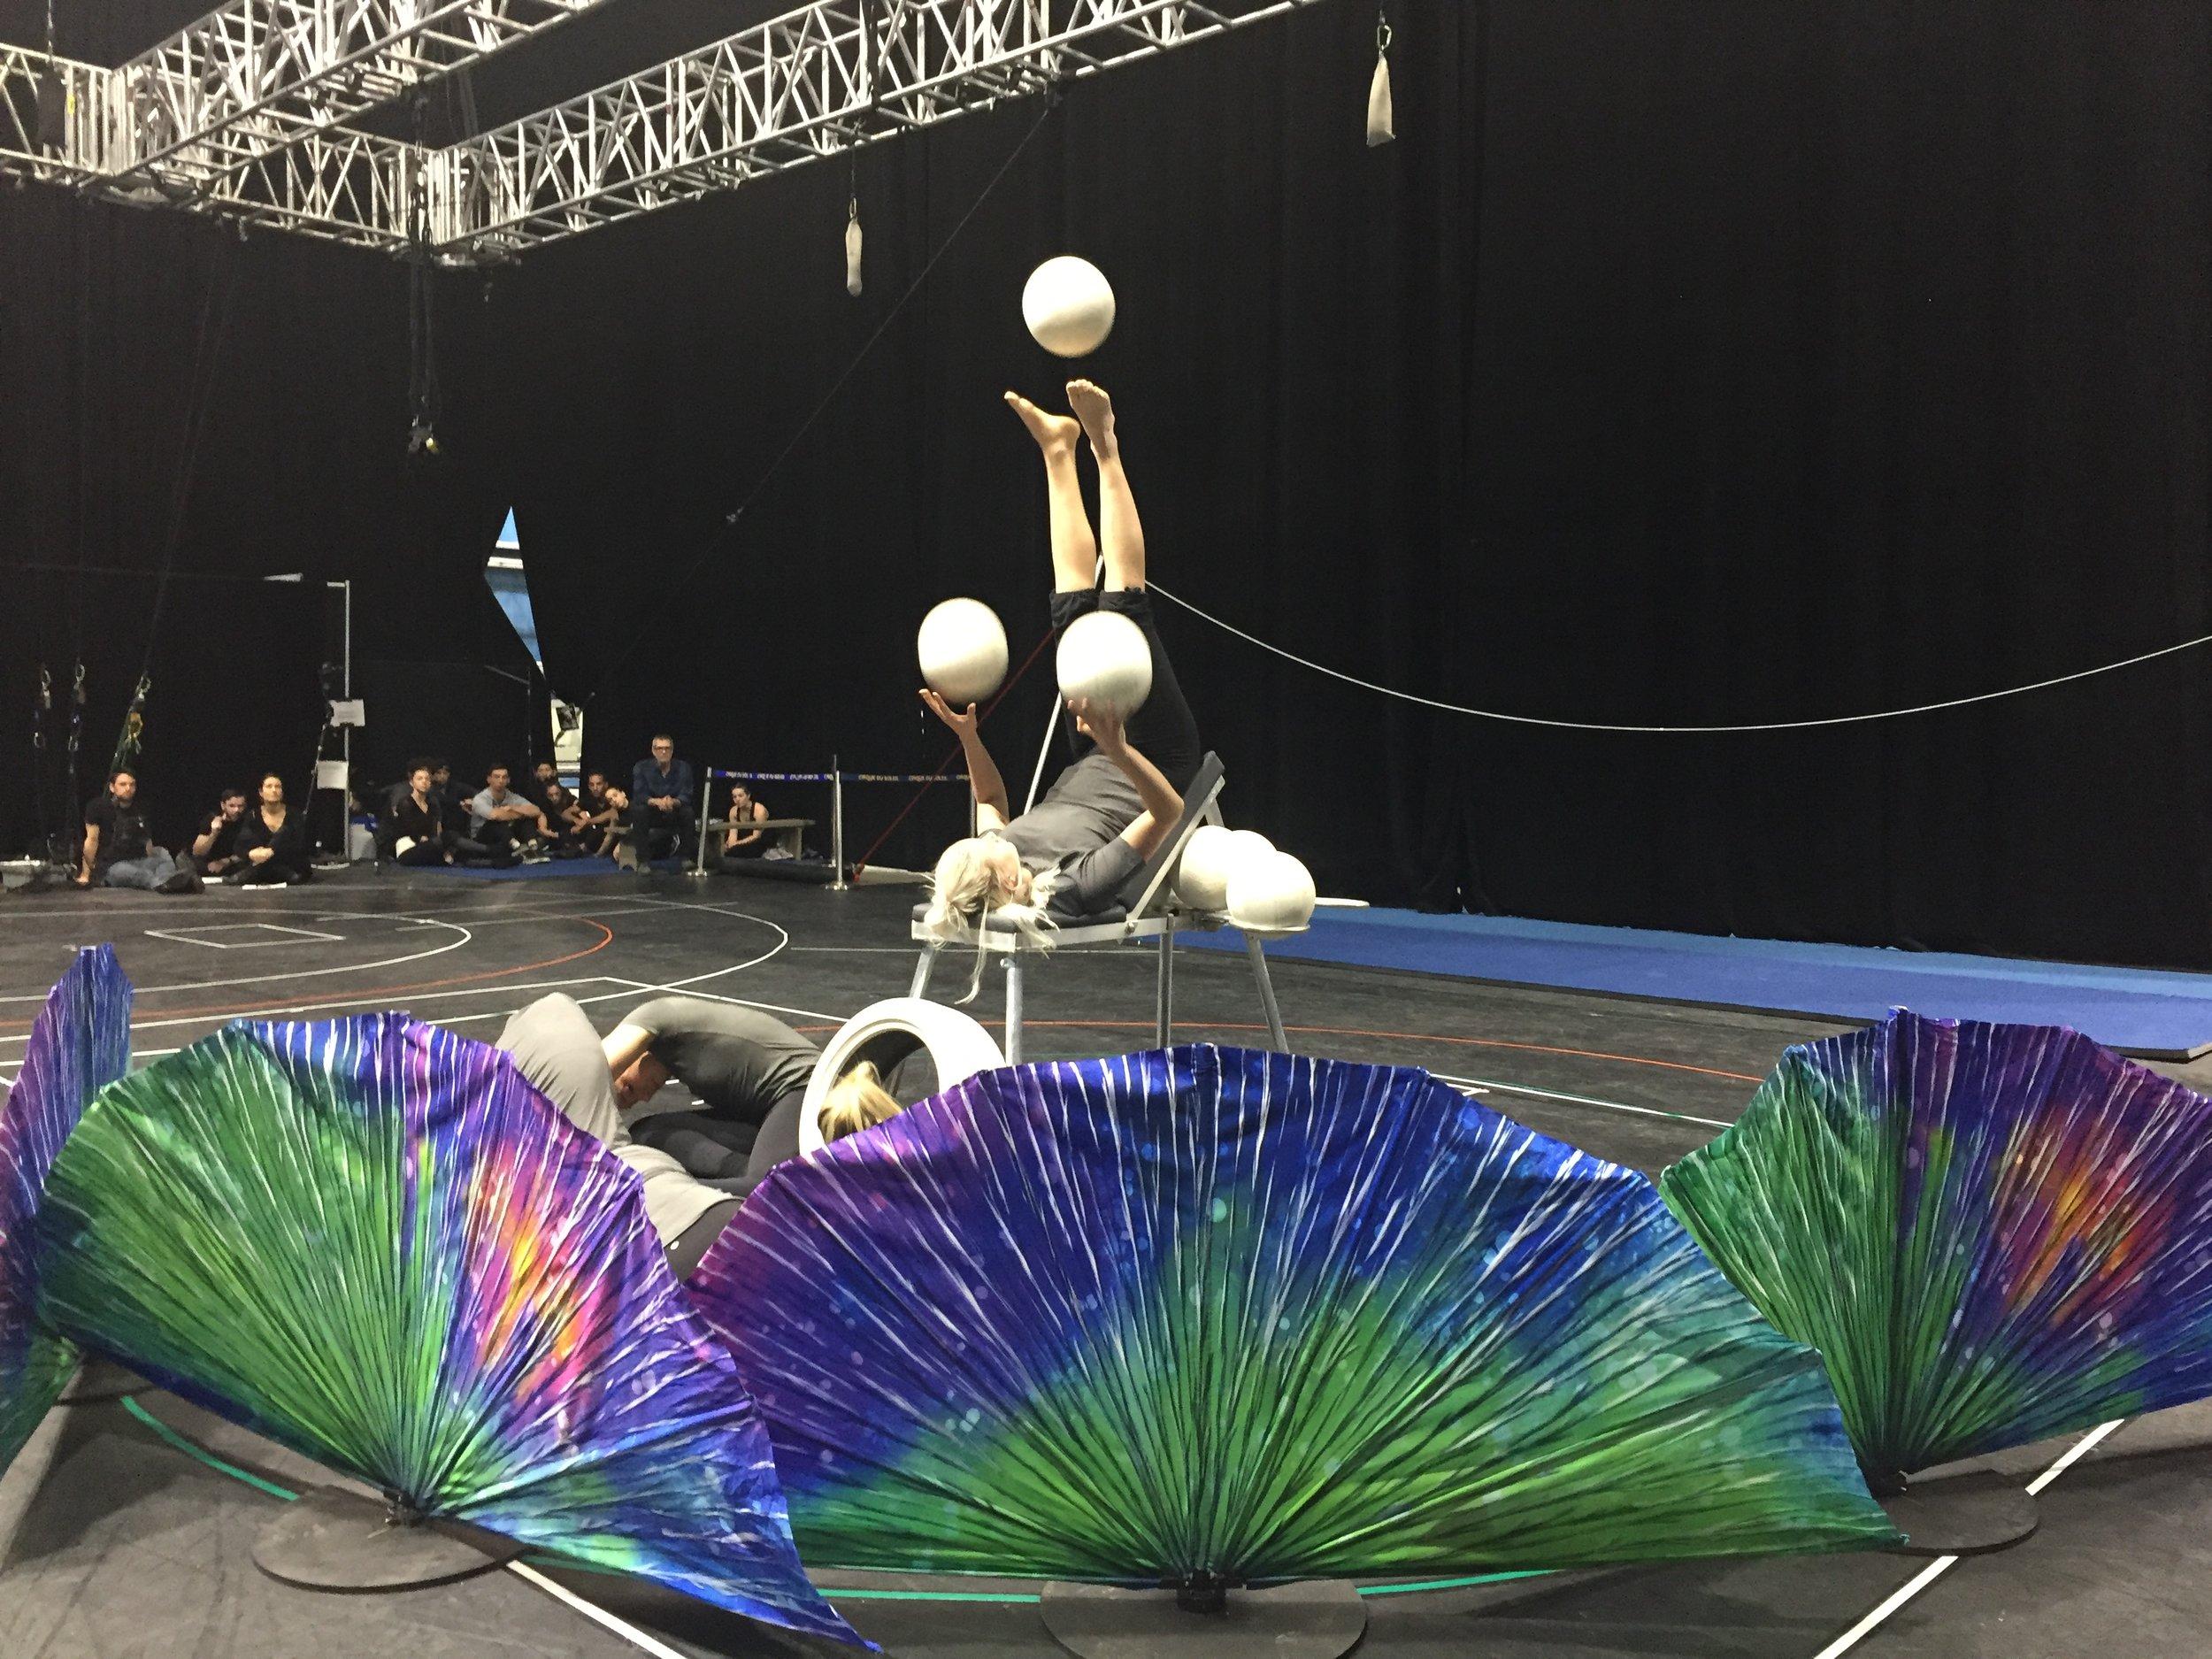 cirque du soleil show juggling.JPG